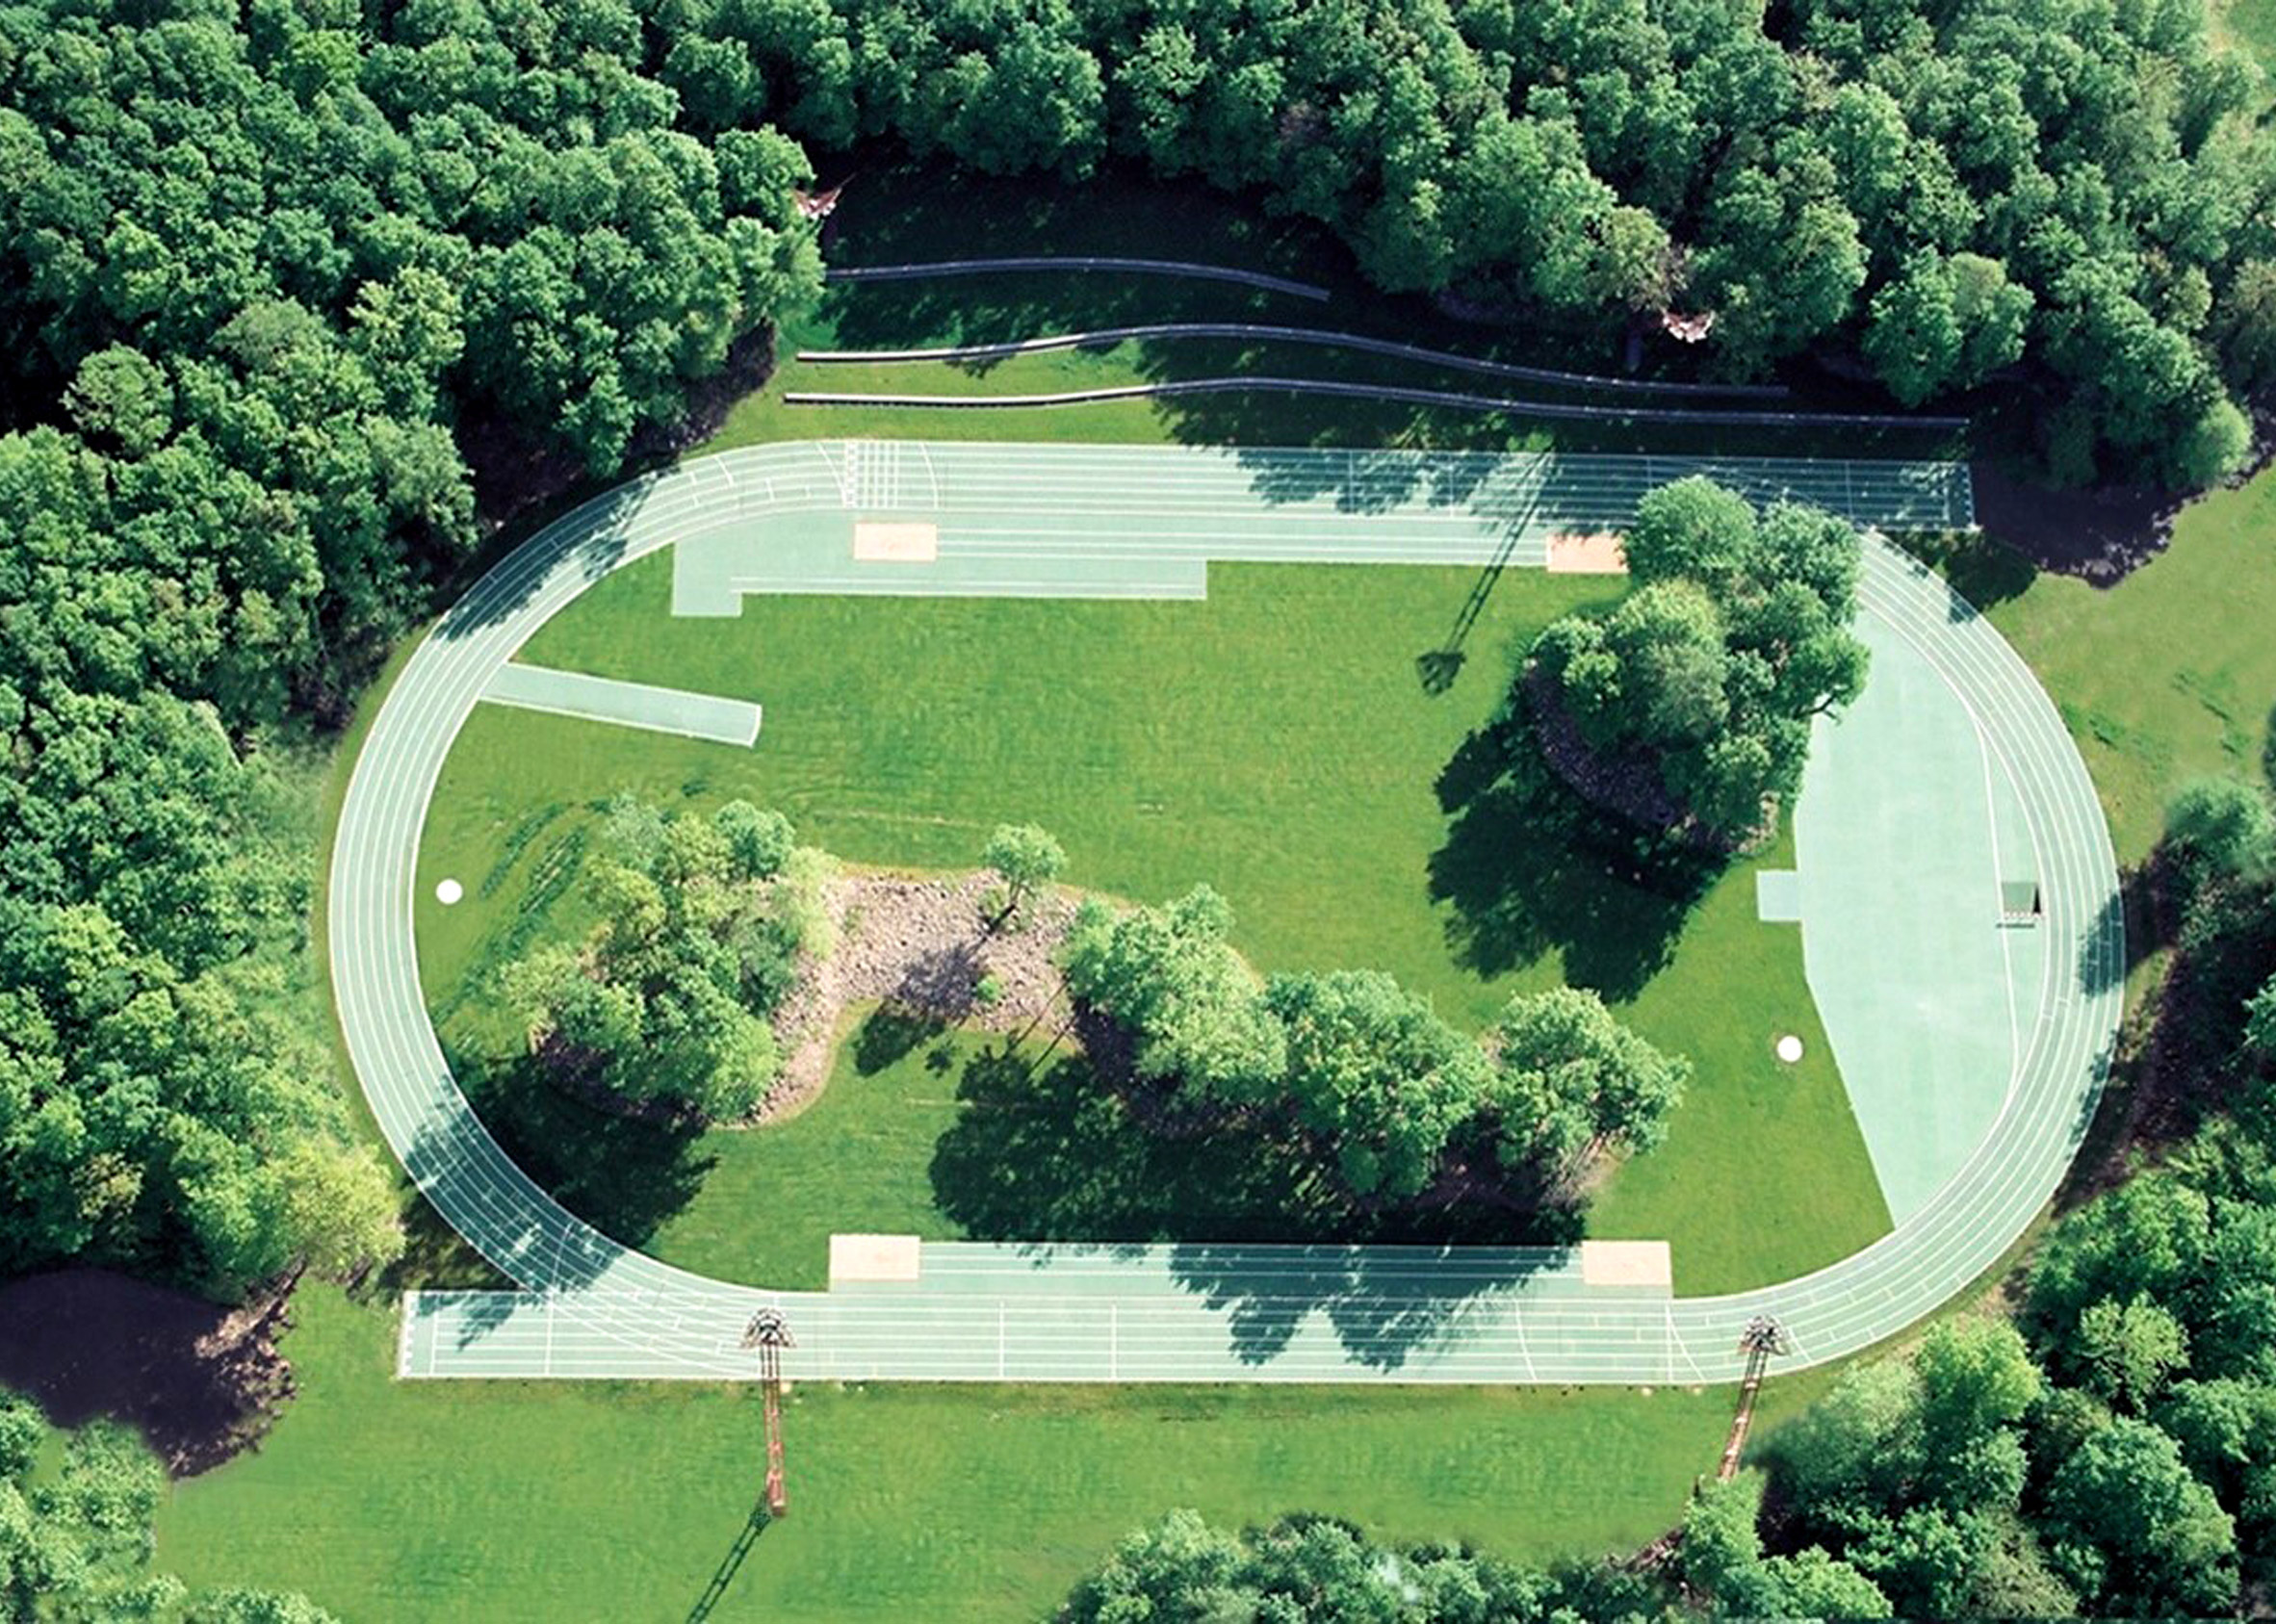 Tossols-Basil Athletics Track, 2000, Olot, Girona, Spain